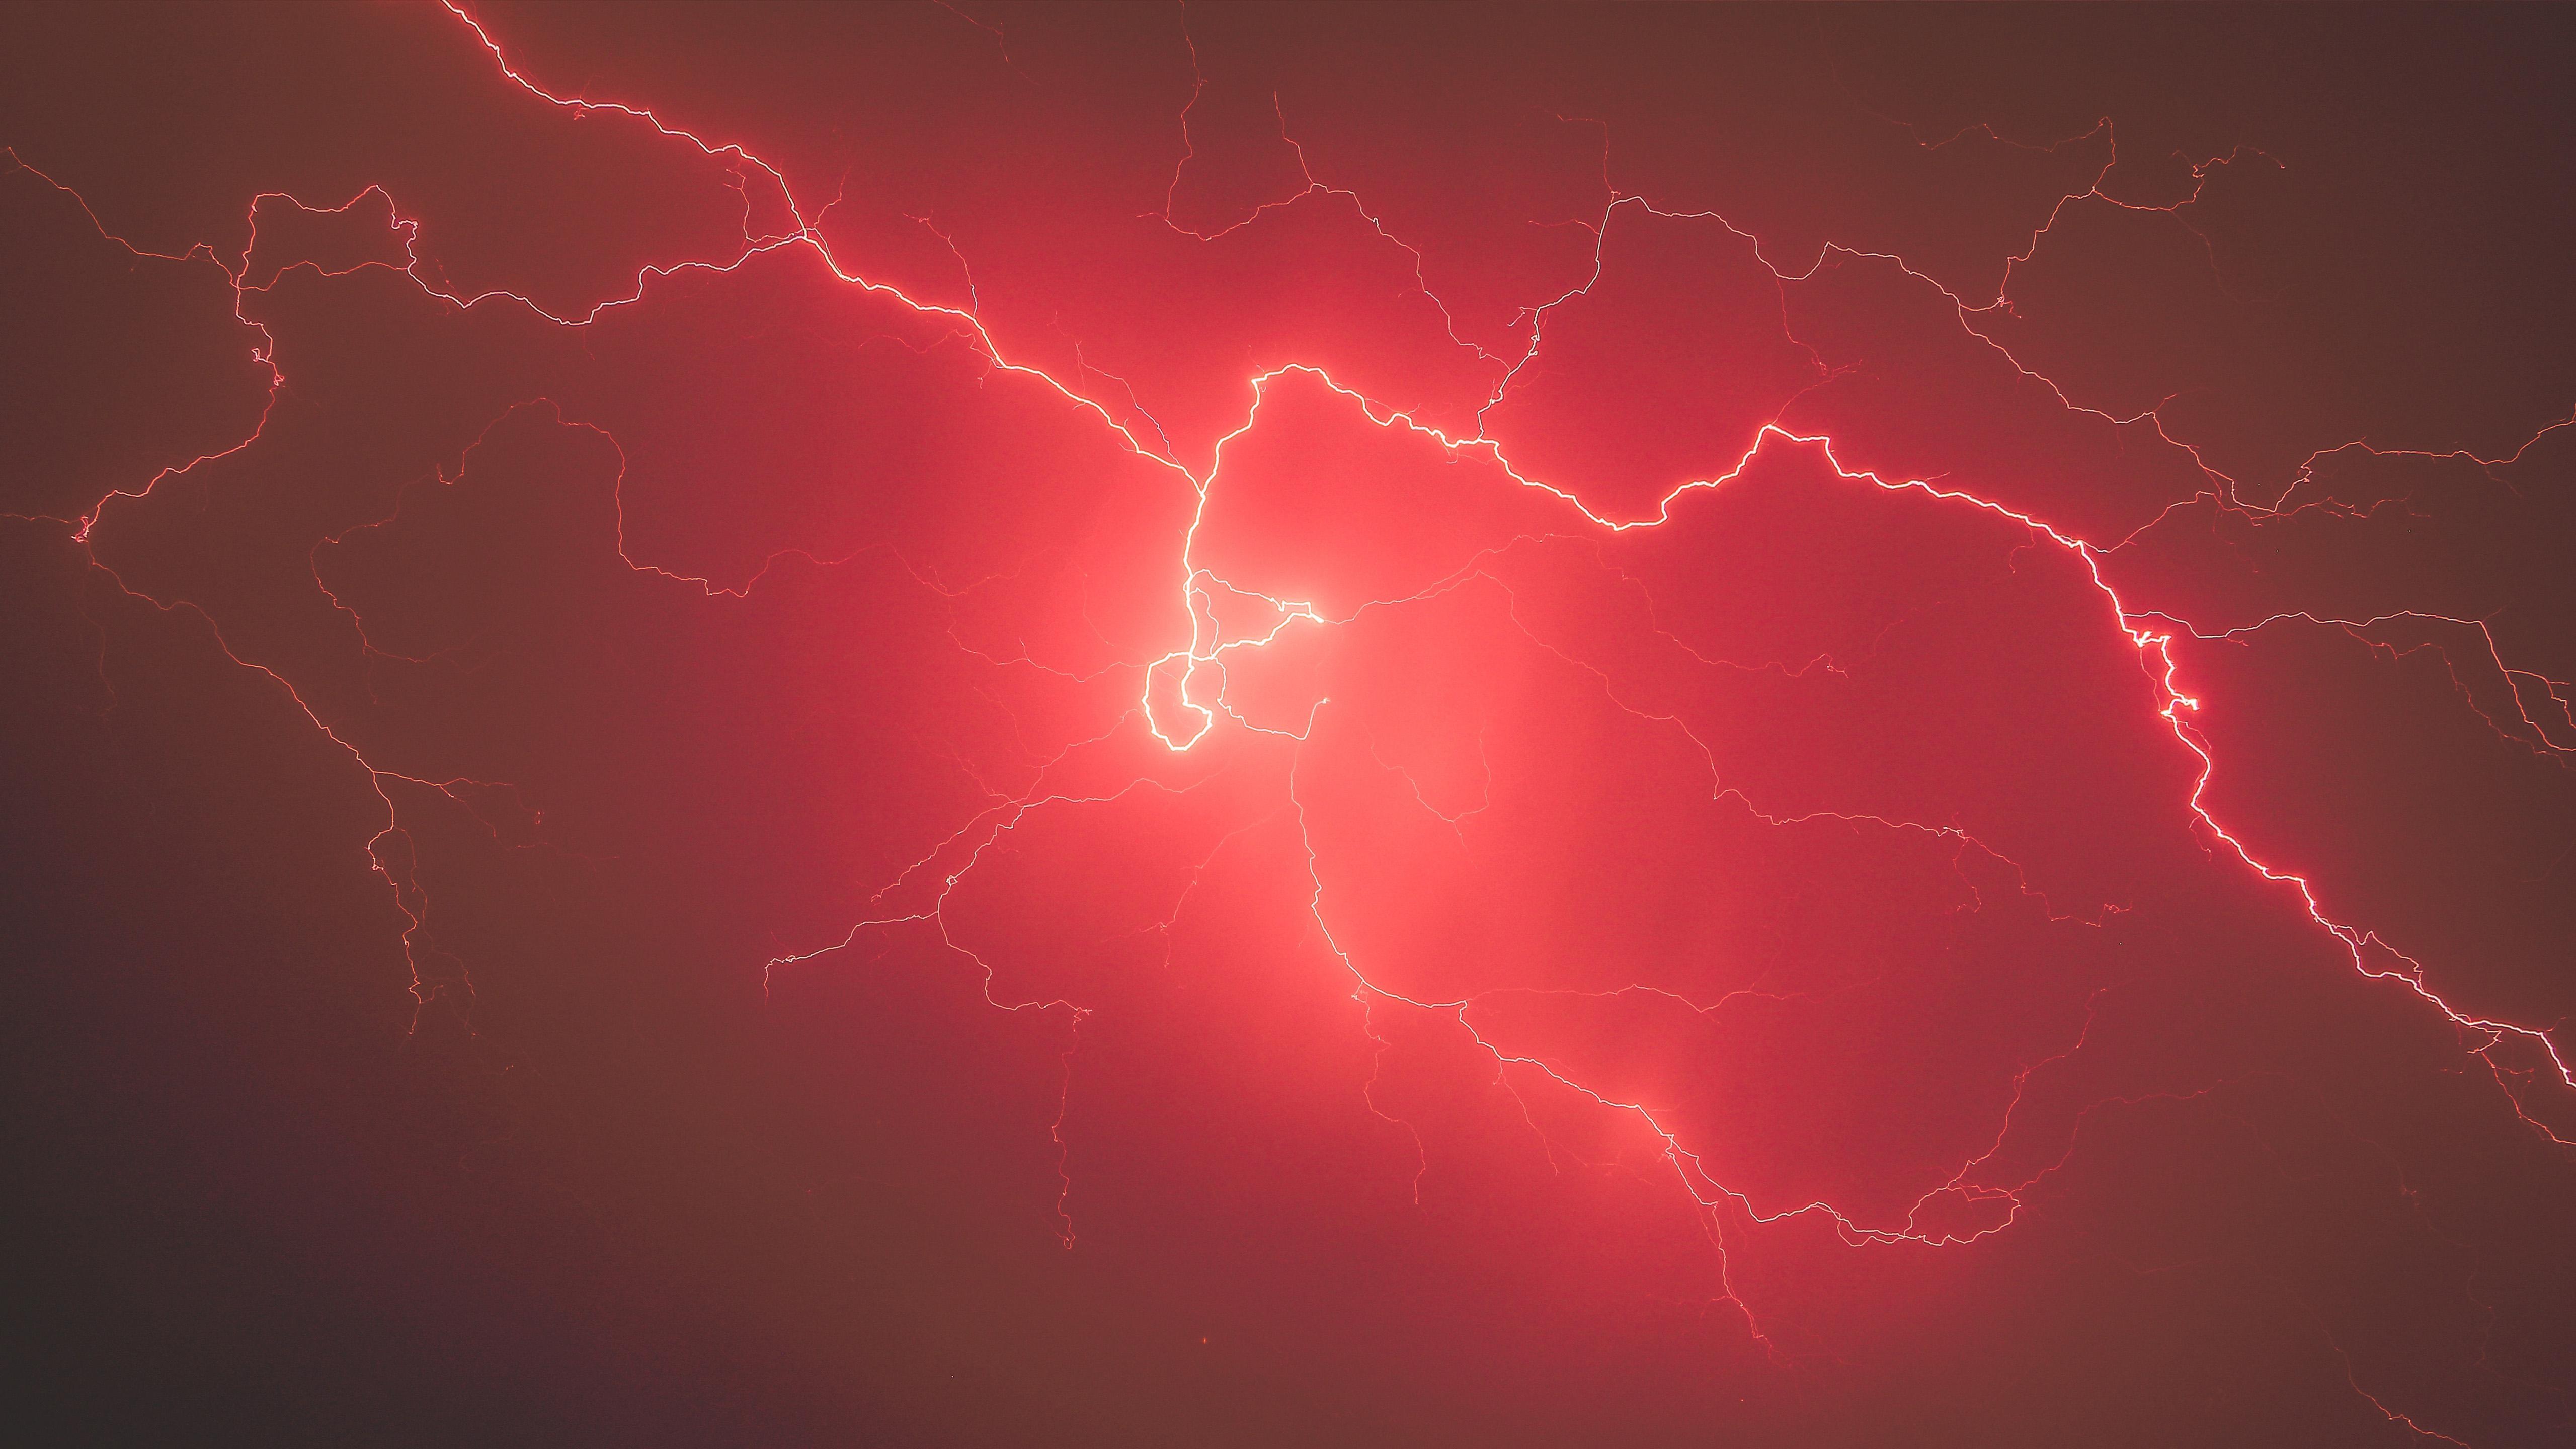 Lightning Storm Red Sky 5k Hd Nature 4k Wallpapers Images